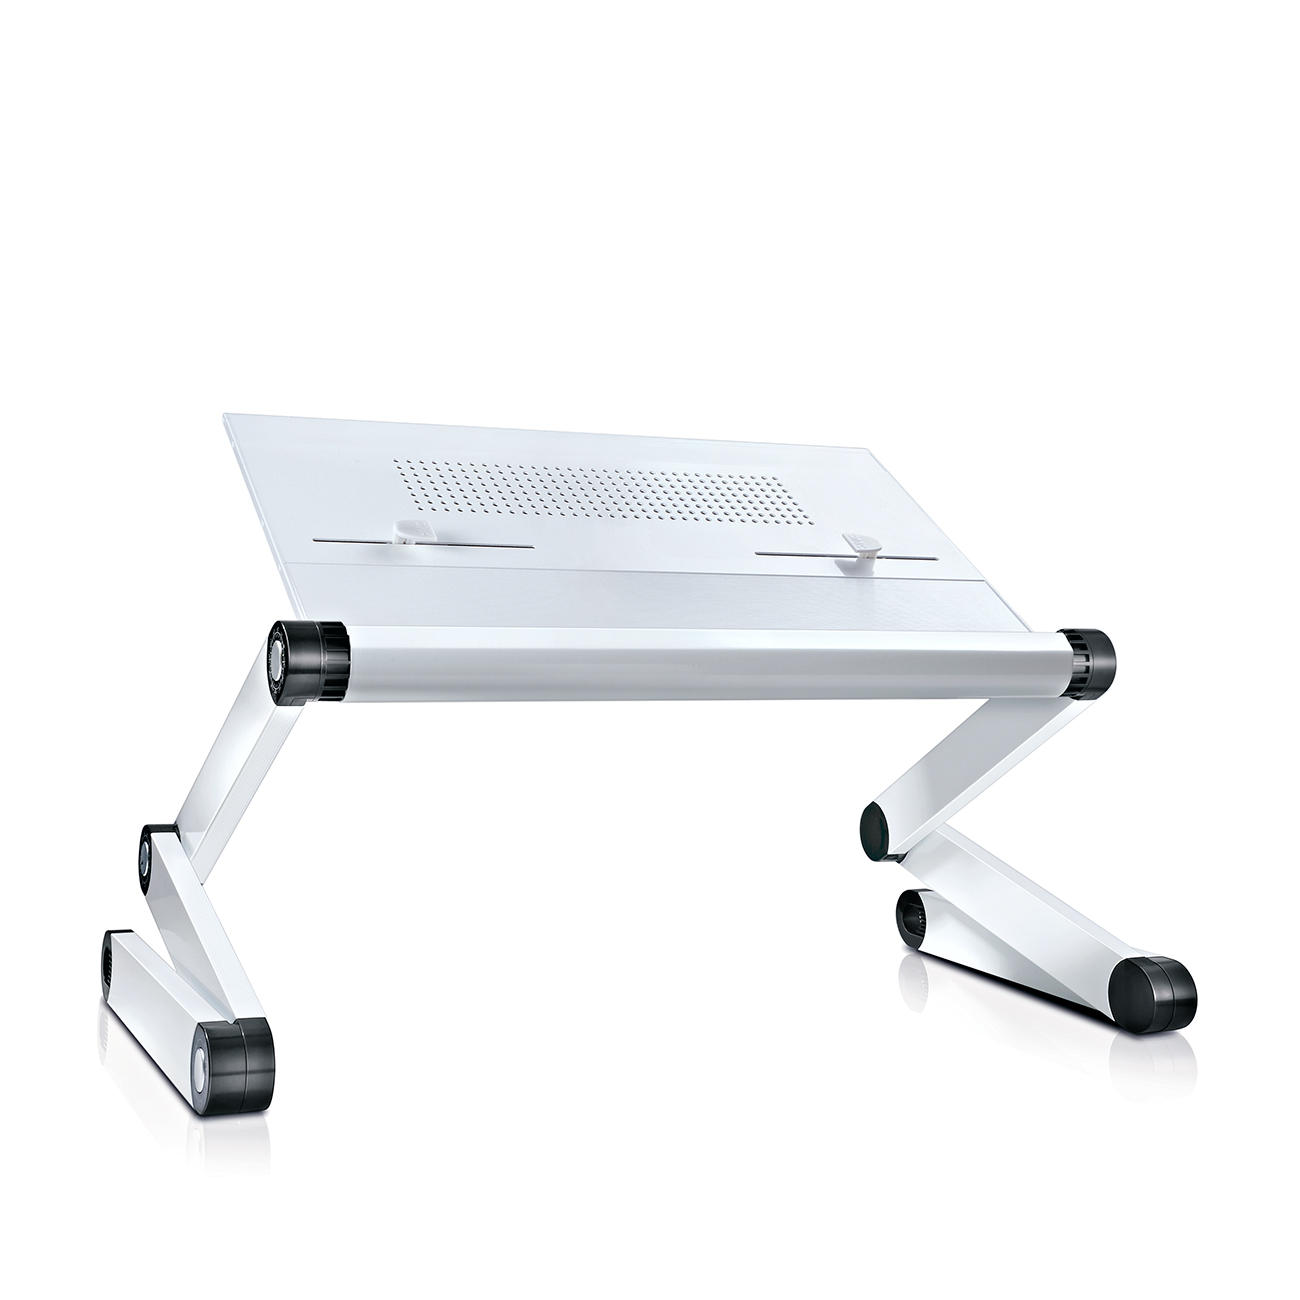 Vario Laptoptisch F 252 Rs Bett 3 Jahre Garantie Pro Idee